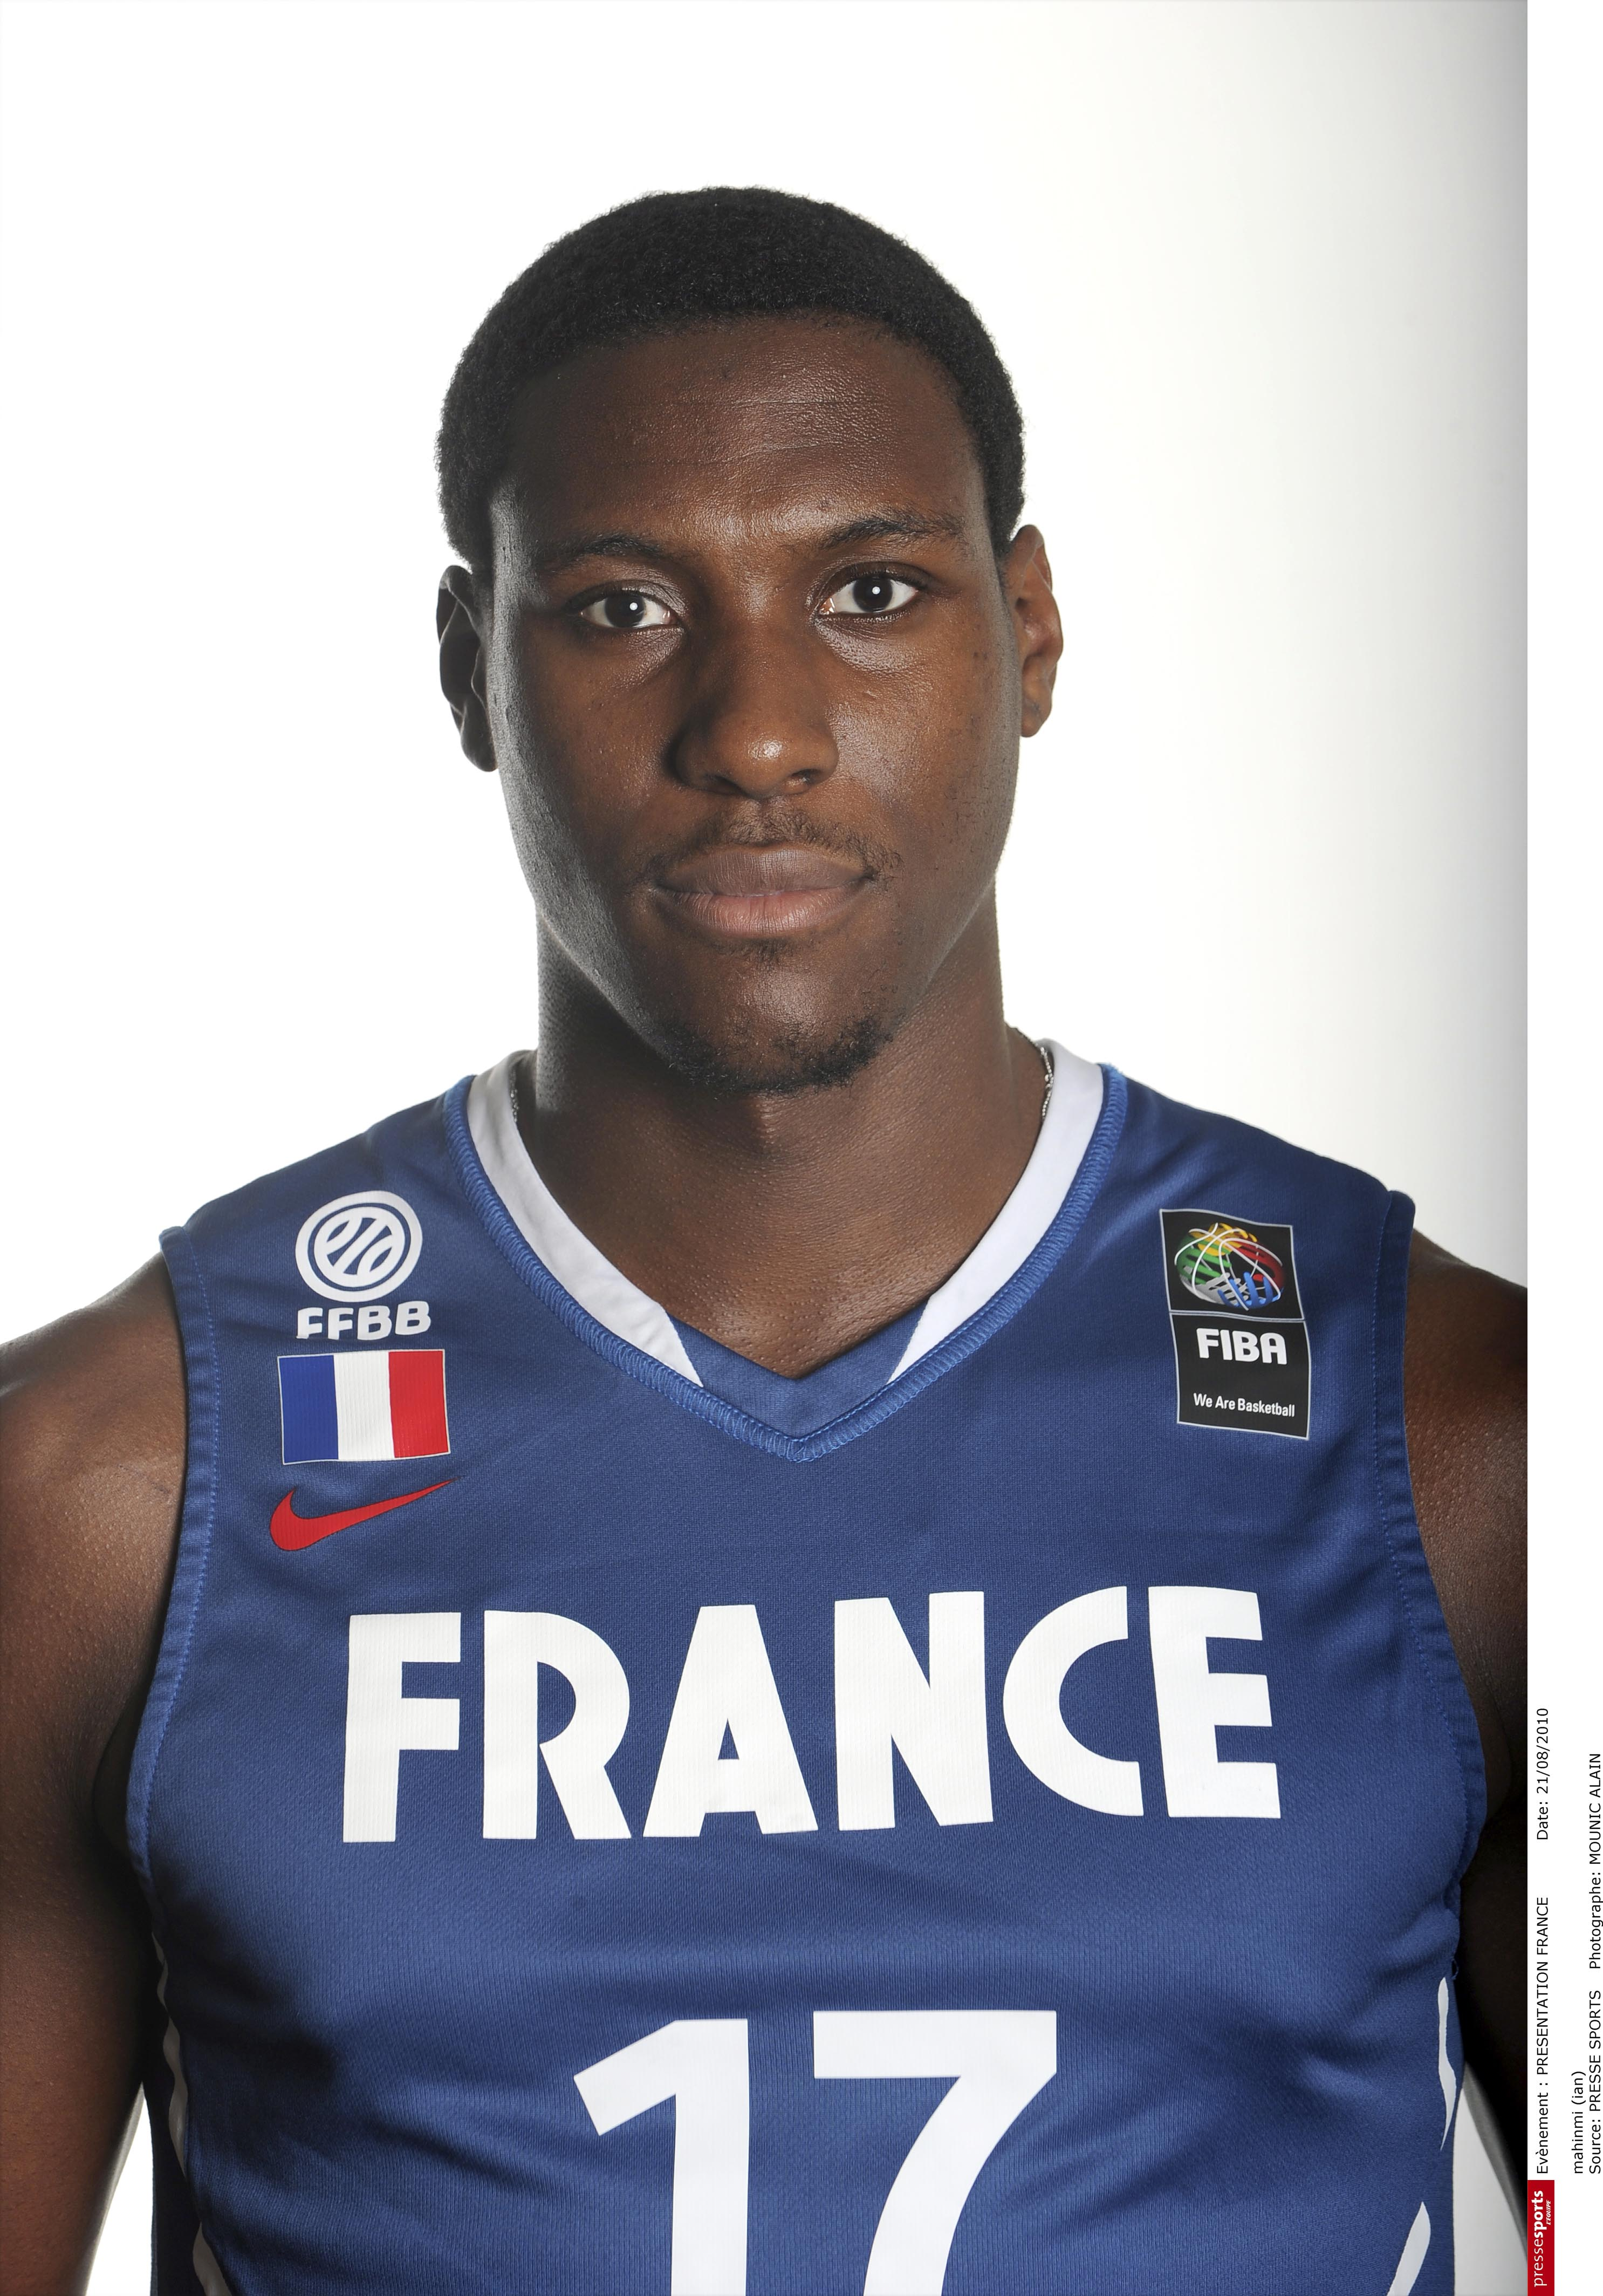 Ian Mahinmi Rejoint Le Groupe France Ffbb